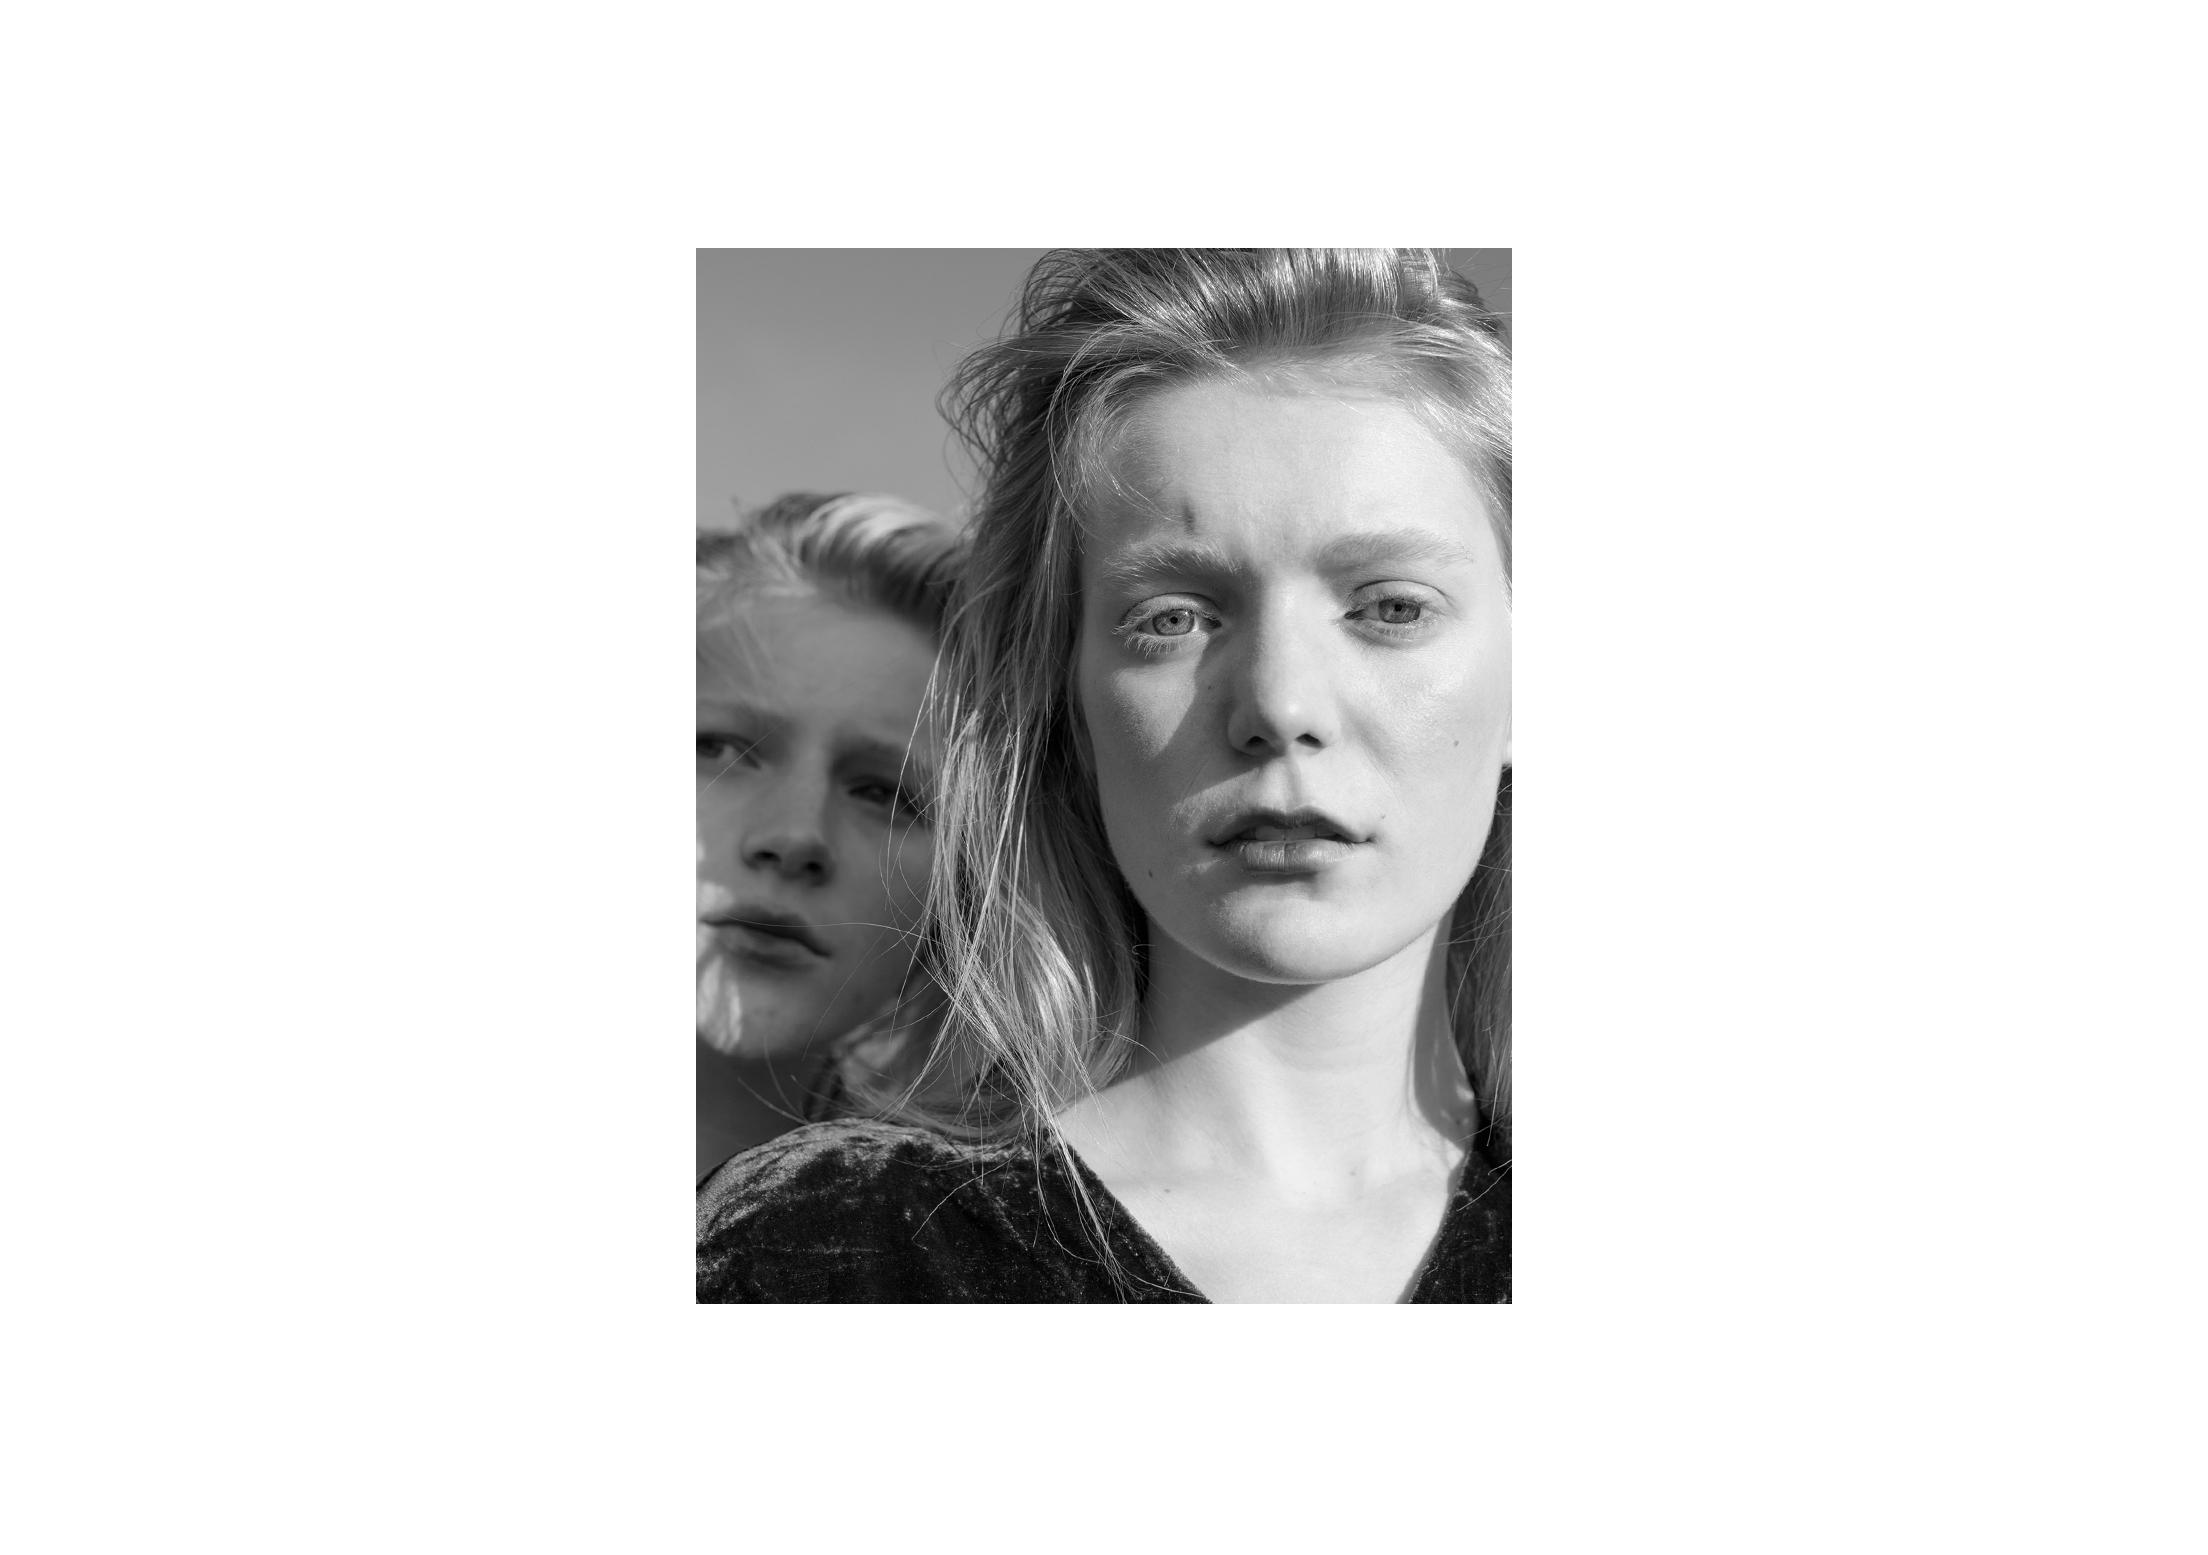 Megan Kellythorn Jute Black and white portrait.jpg